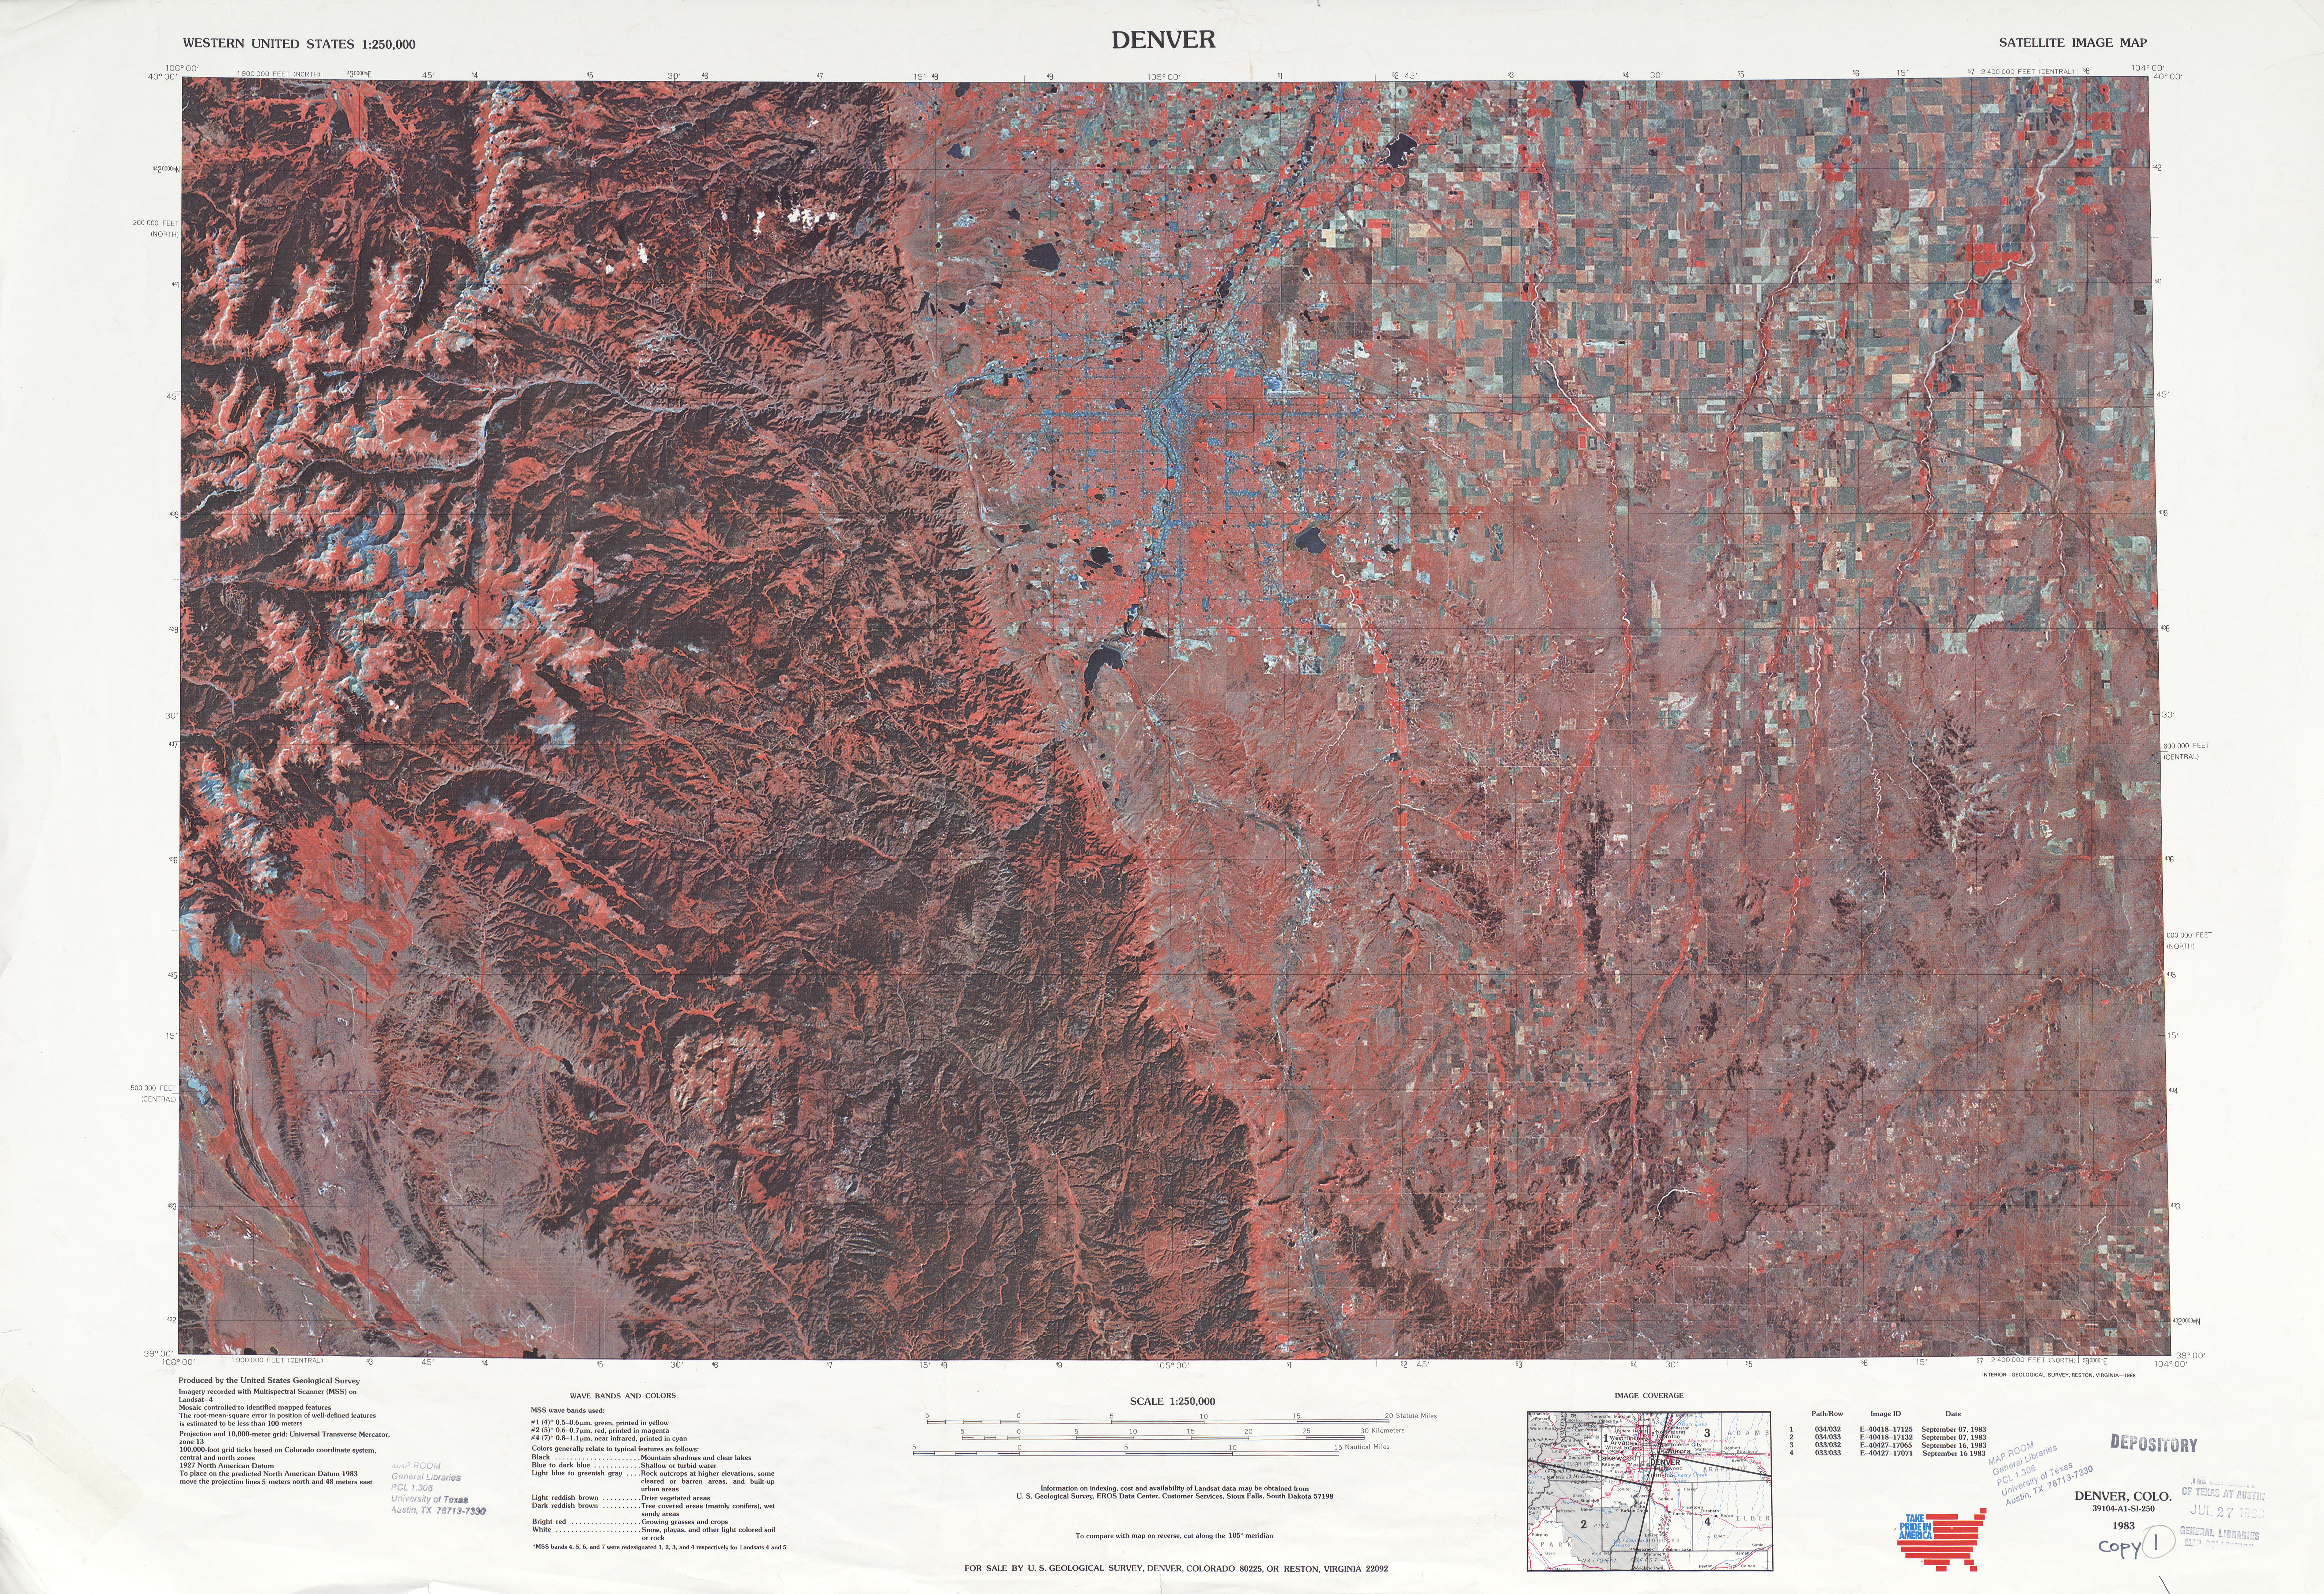 Denver Satellite Image Sheet, United States 1978